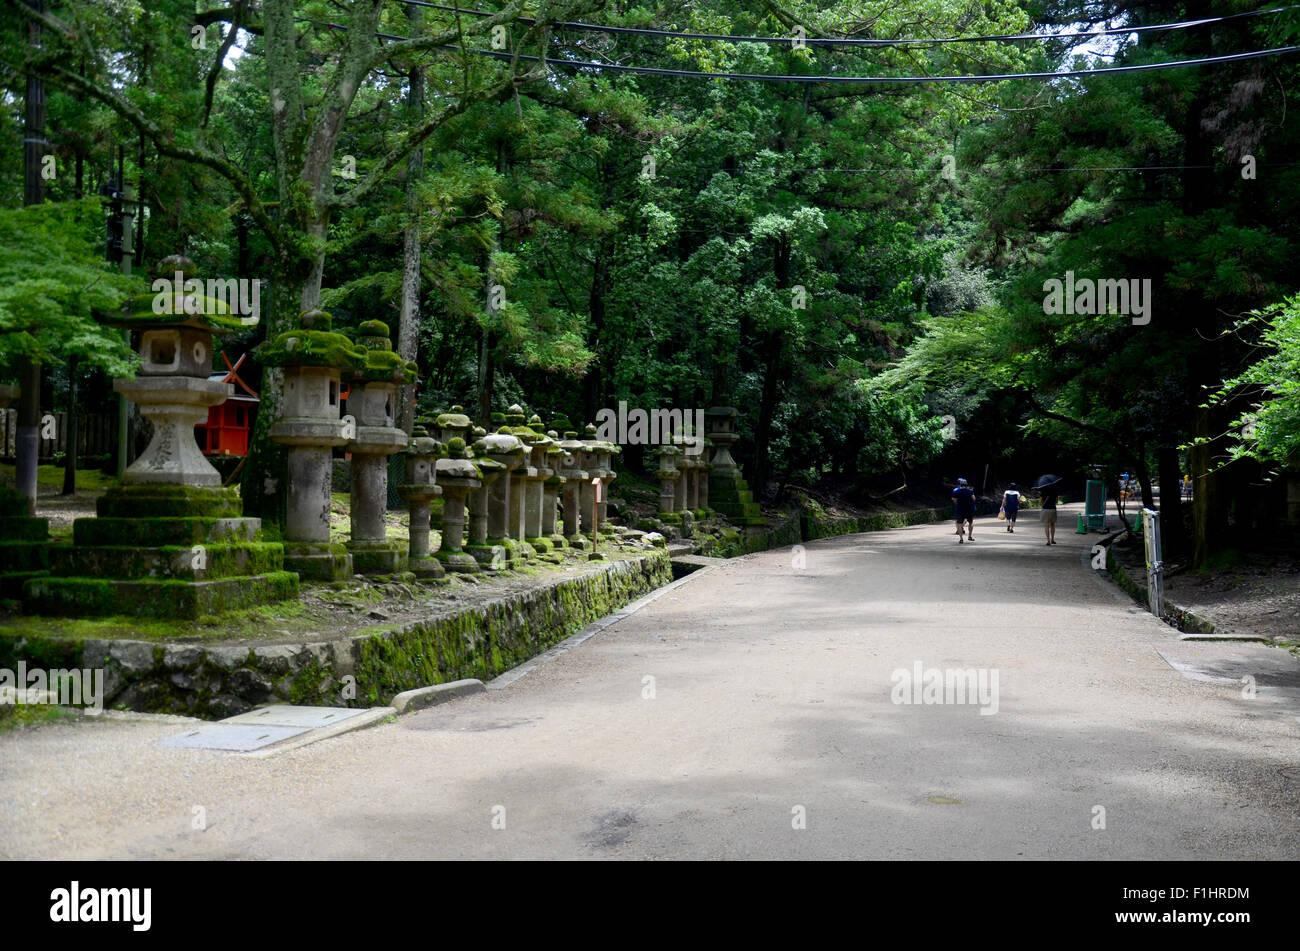 Traveler walking on pathway go to Kasuga Shrine on July 9, 2015 in Nara, Japan - Stock Image